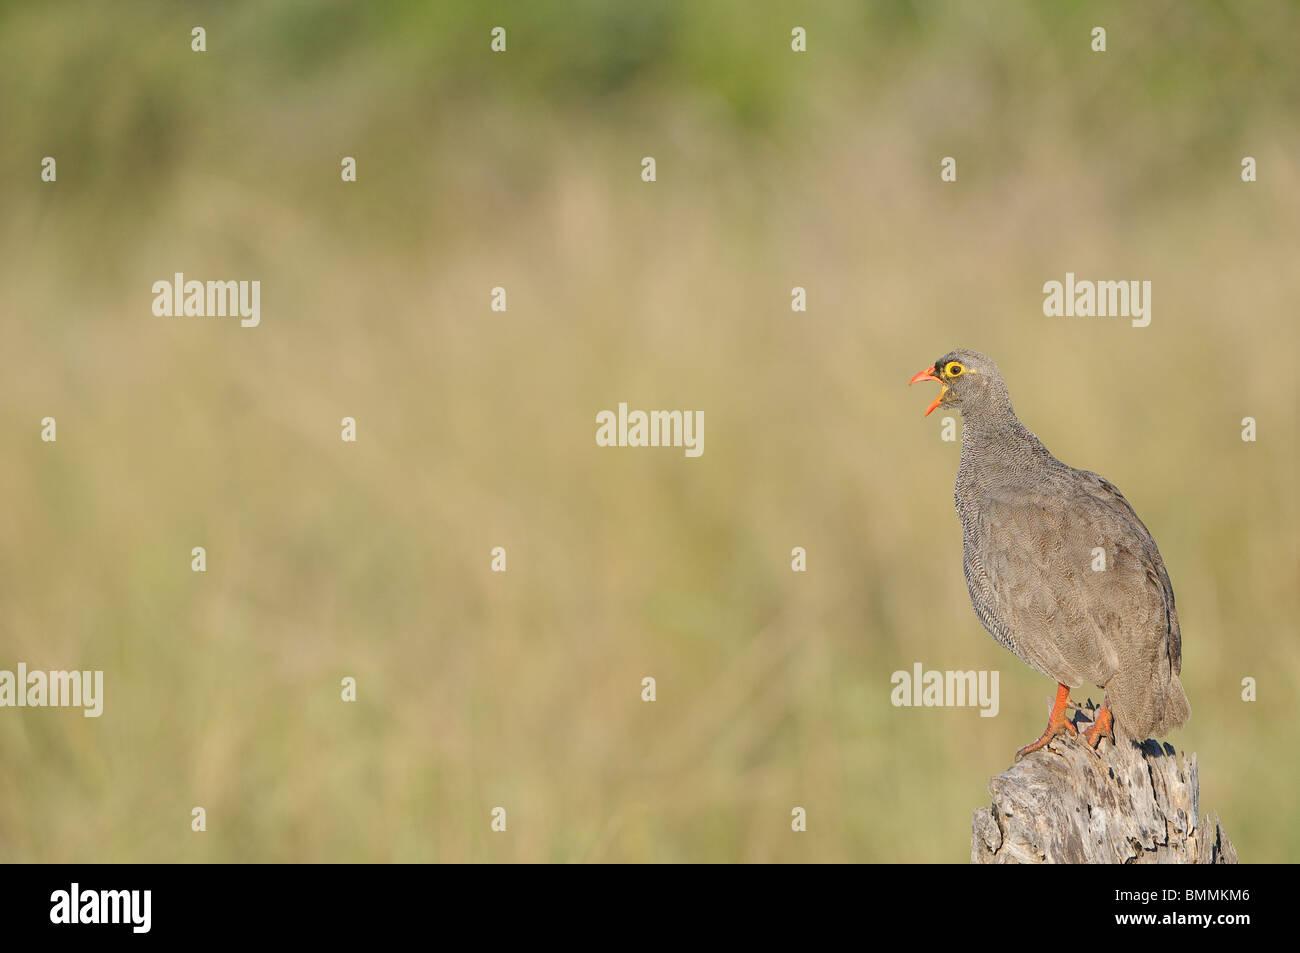 Partridge (Phasianidae) calling, Mapungubwe Game Reserve, Limpopo Province, South Africa - Stock Image